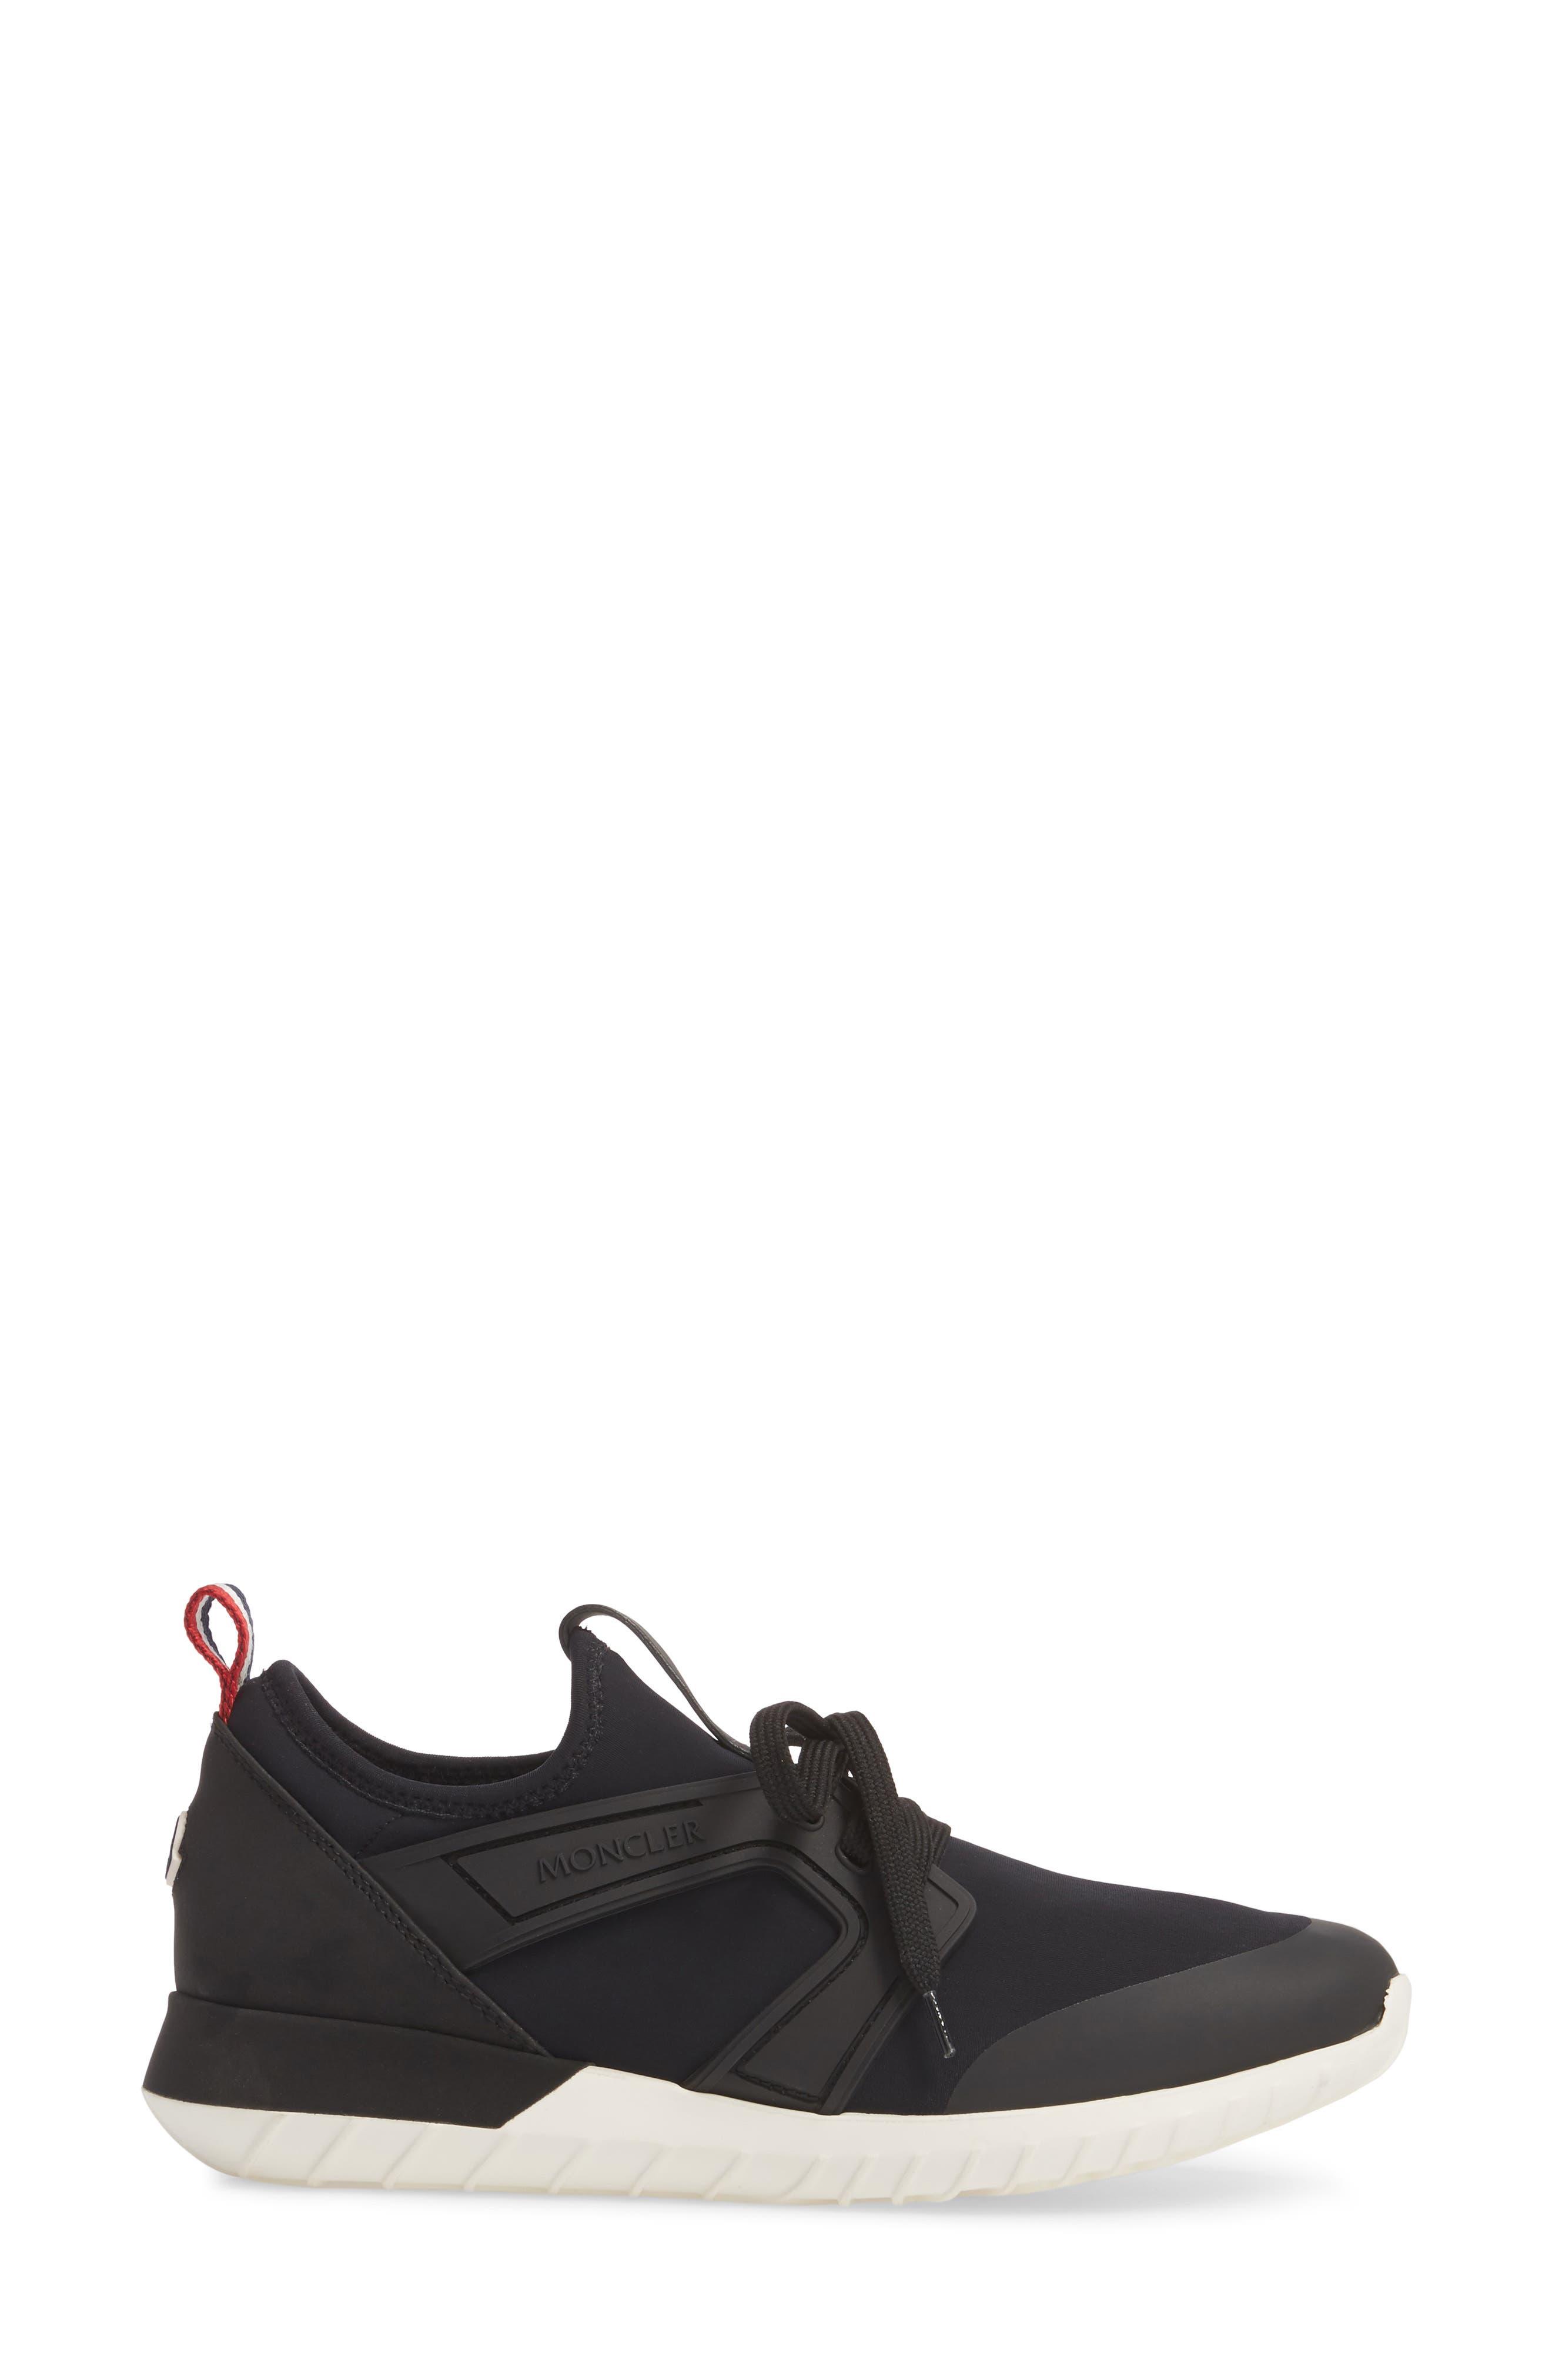 Meline Lace-Up Sneaker,                             Alternate thumbnail 3, color,                             001